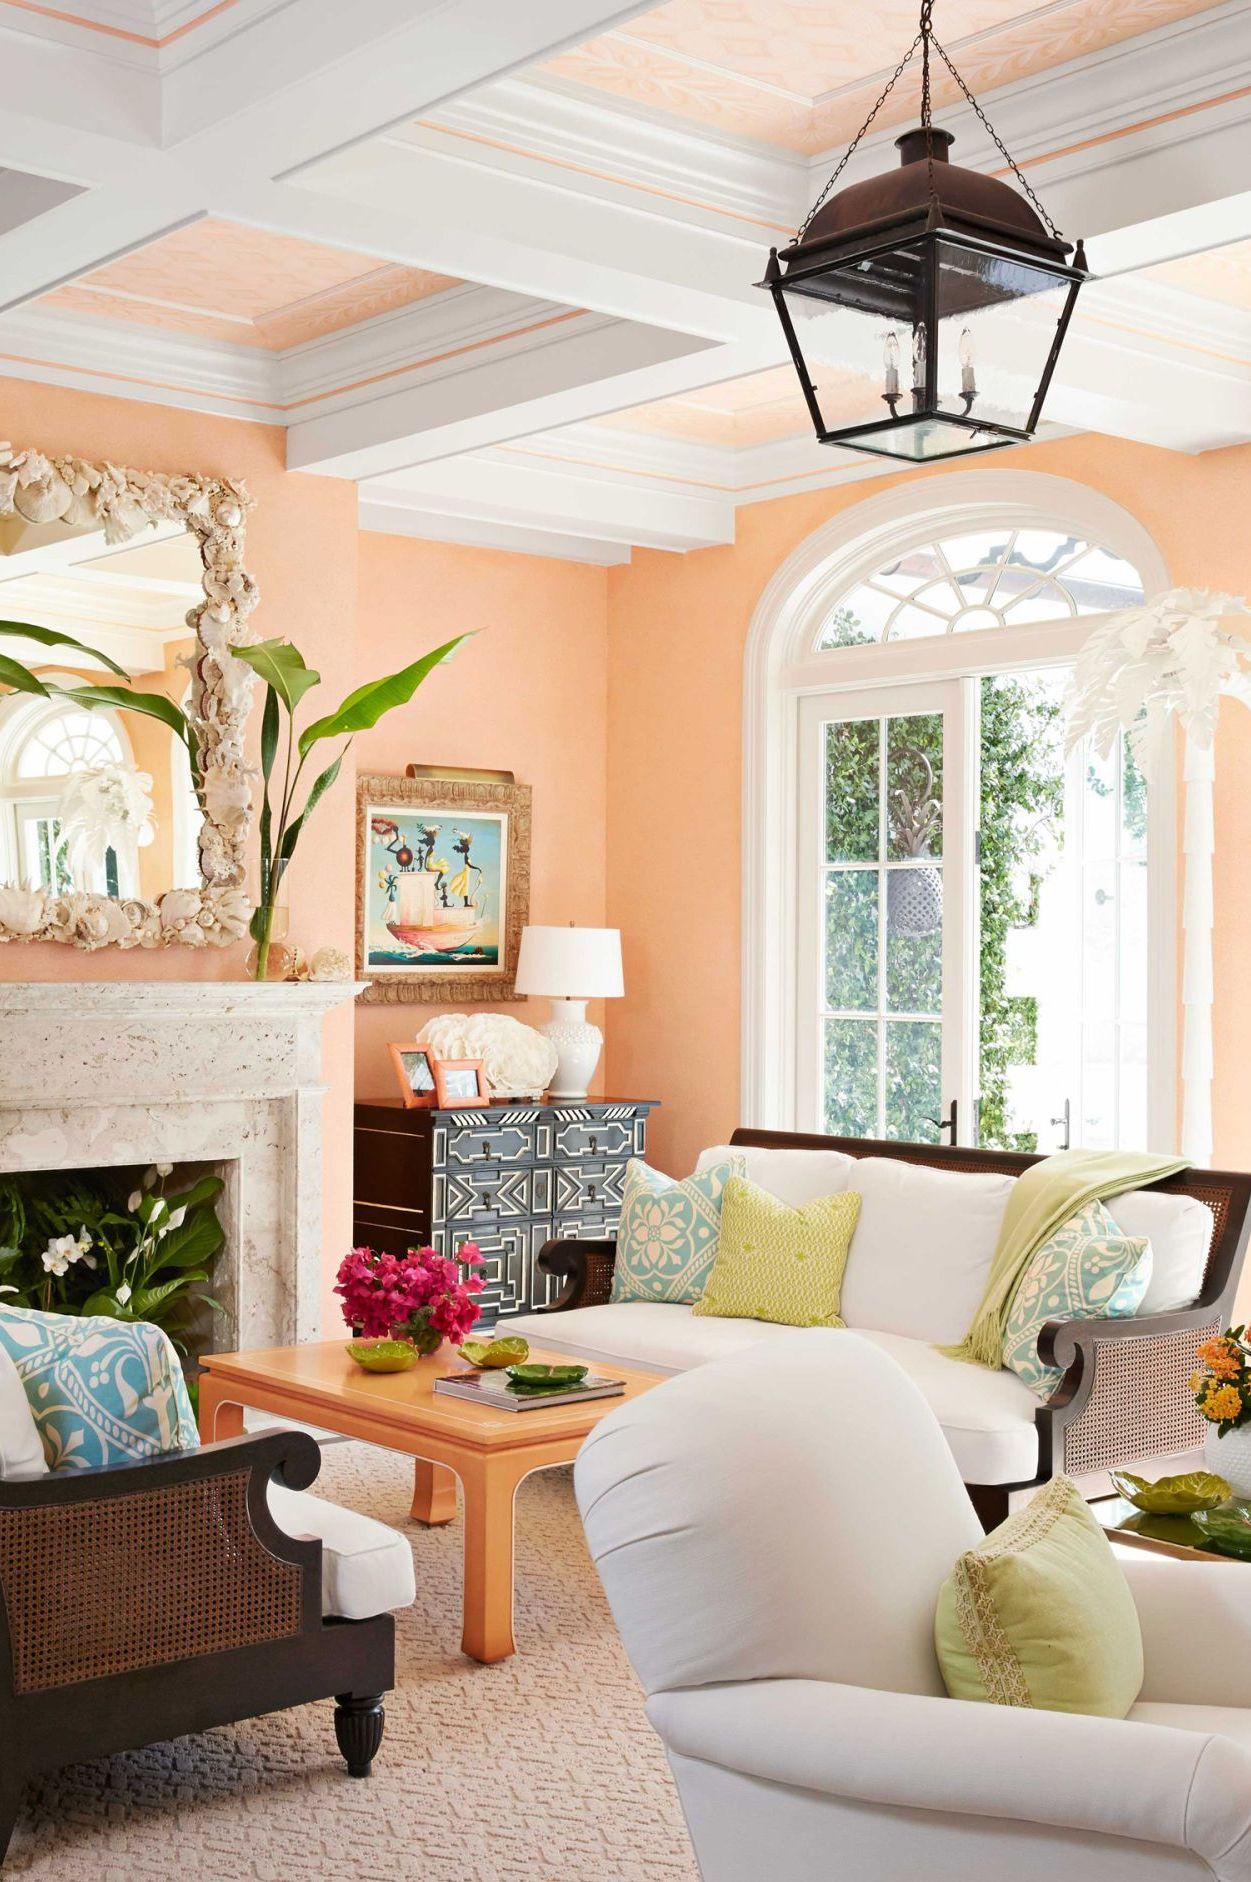 living room color ideas 25 Best Living Room Color Ideas   Top Paint Colors for Living Rooms living room color ideas